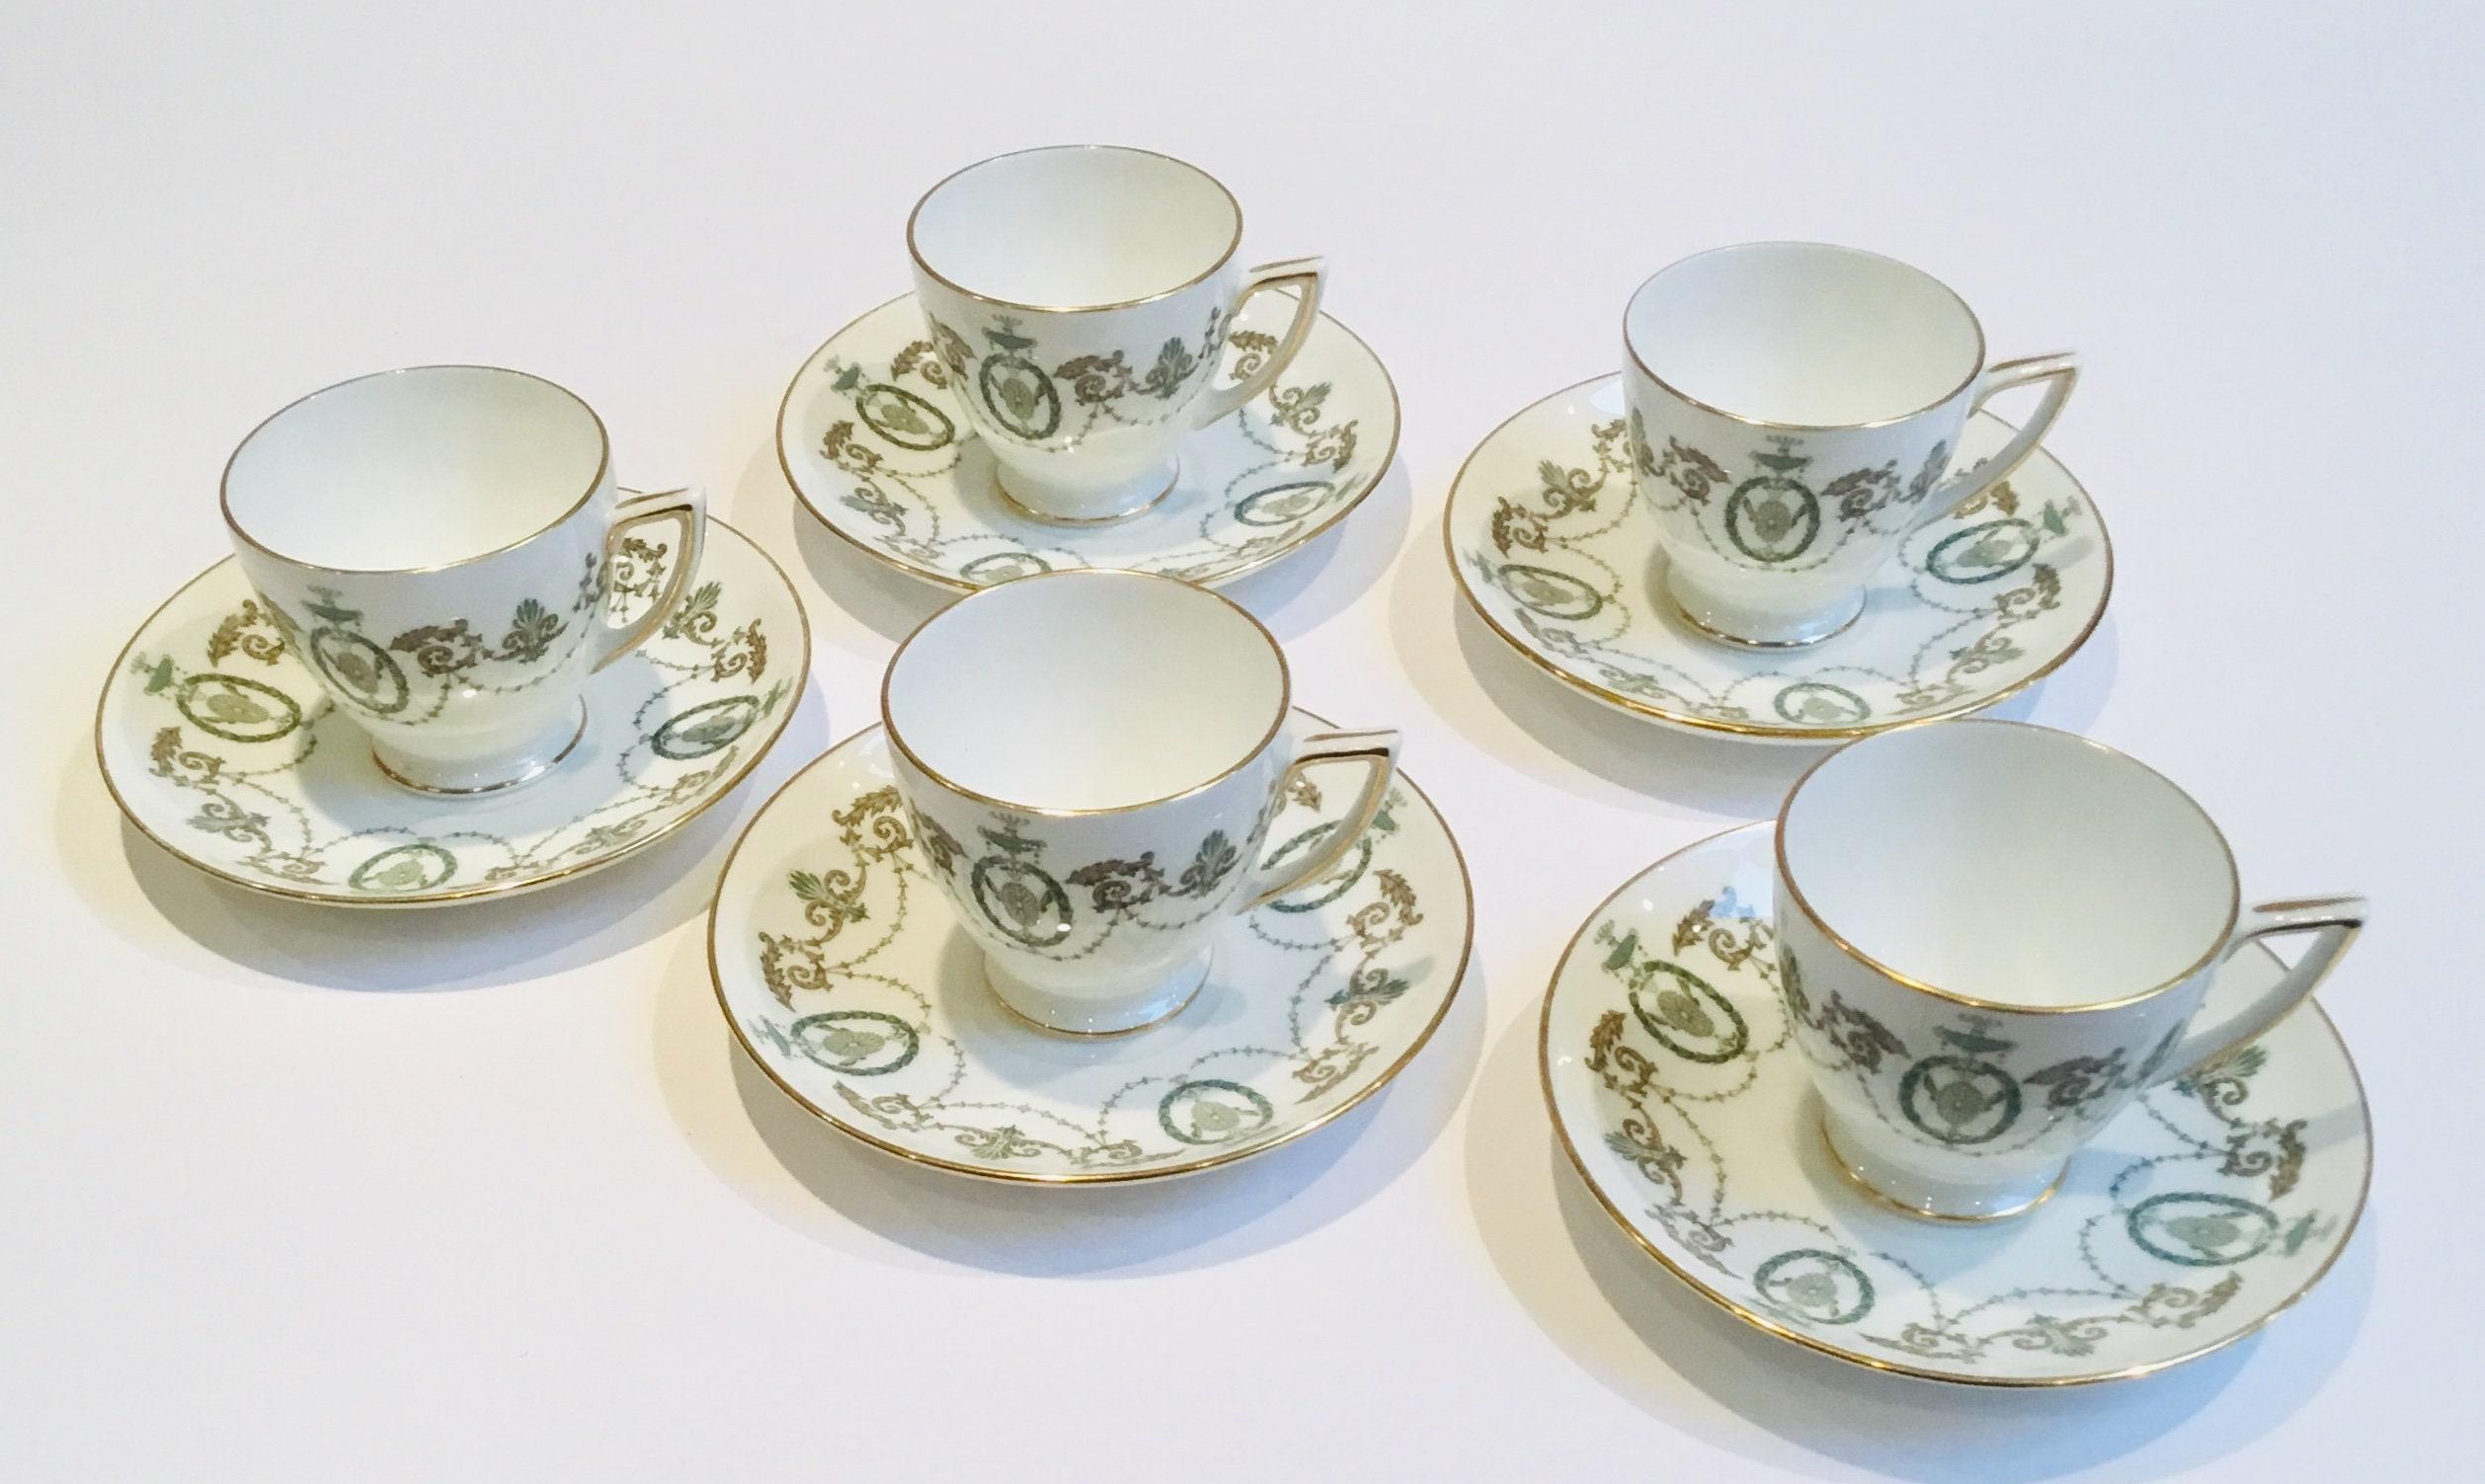 GOLD STANDARD CHINA DEMITASSE TEA CUP /& SAUCER SET  NEW    5